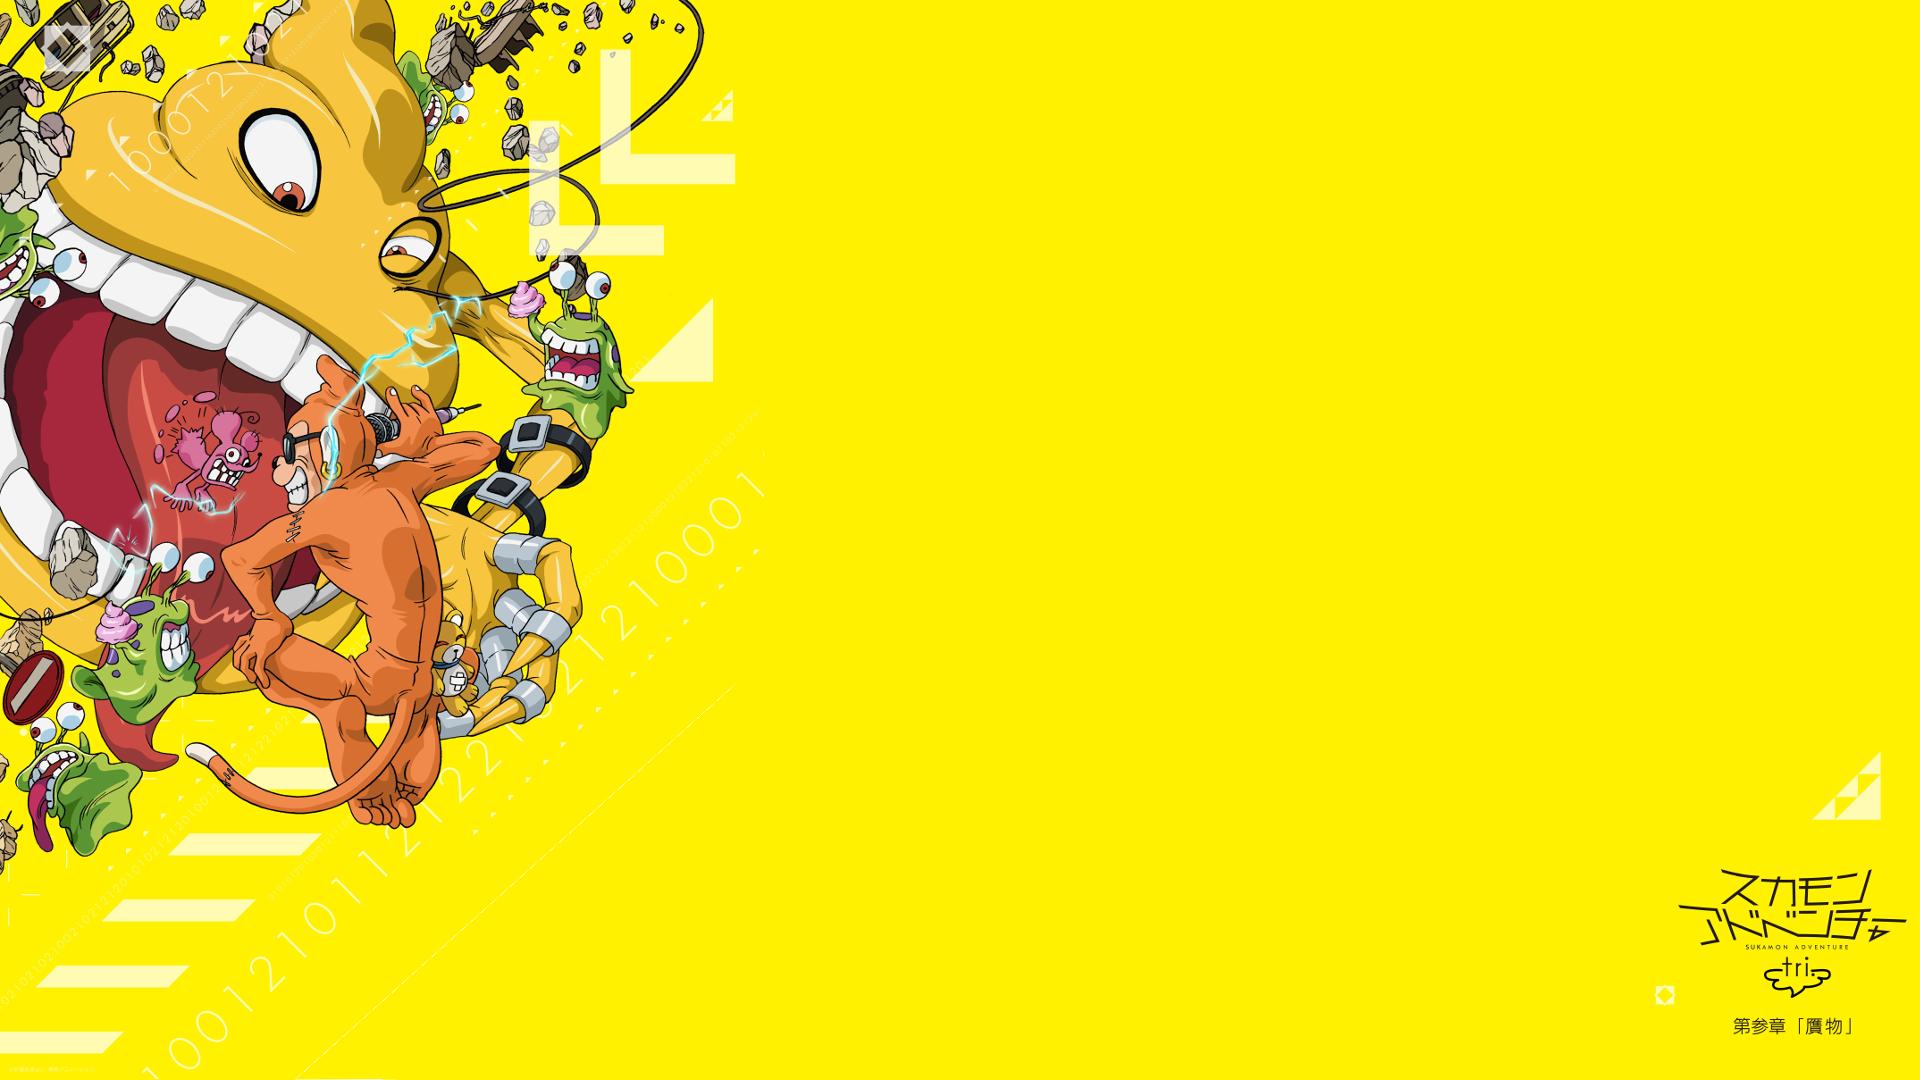 Wallpaper Illustration Anime Minimalism Text Digimon Yellow